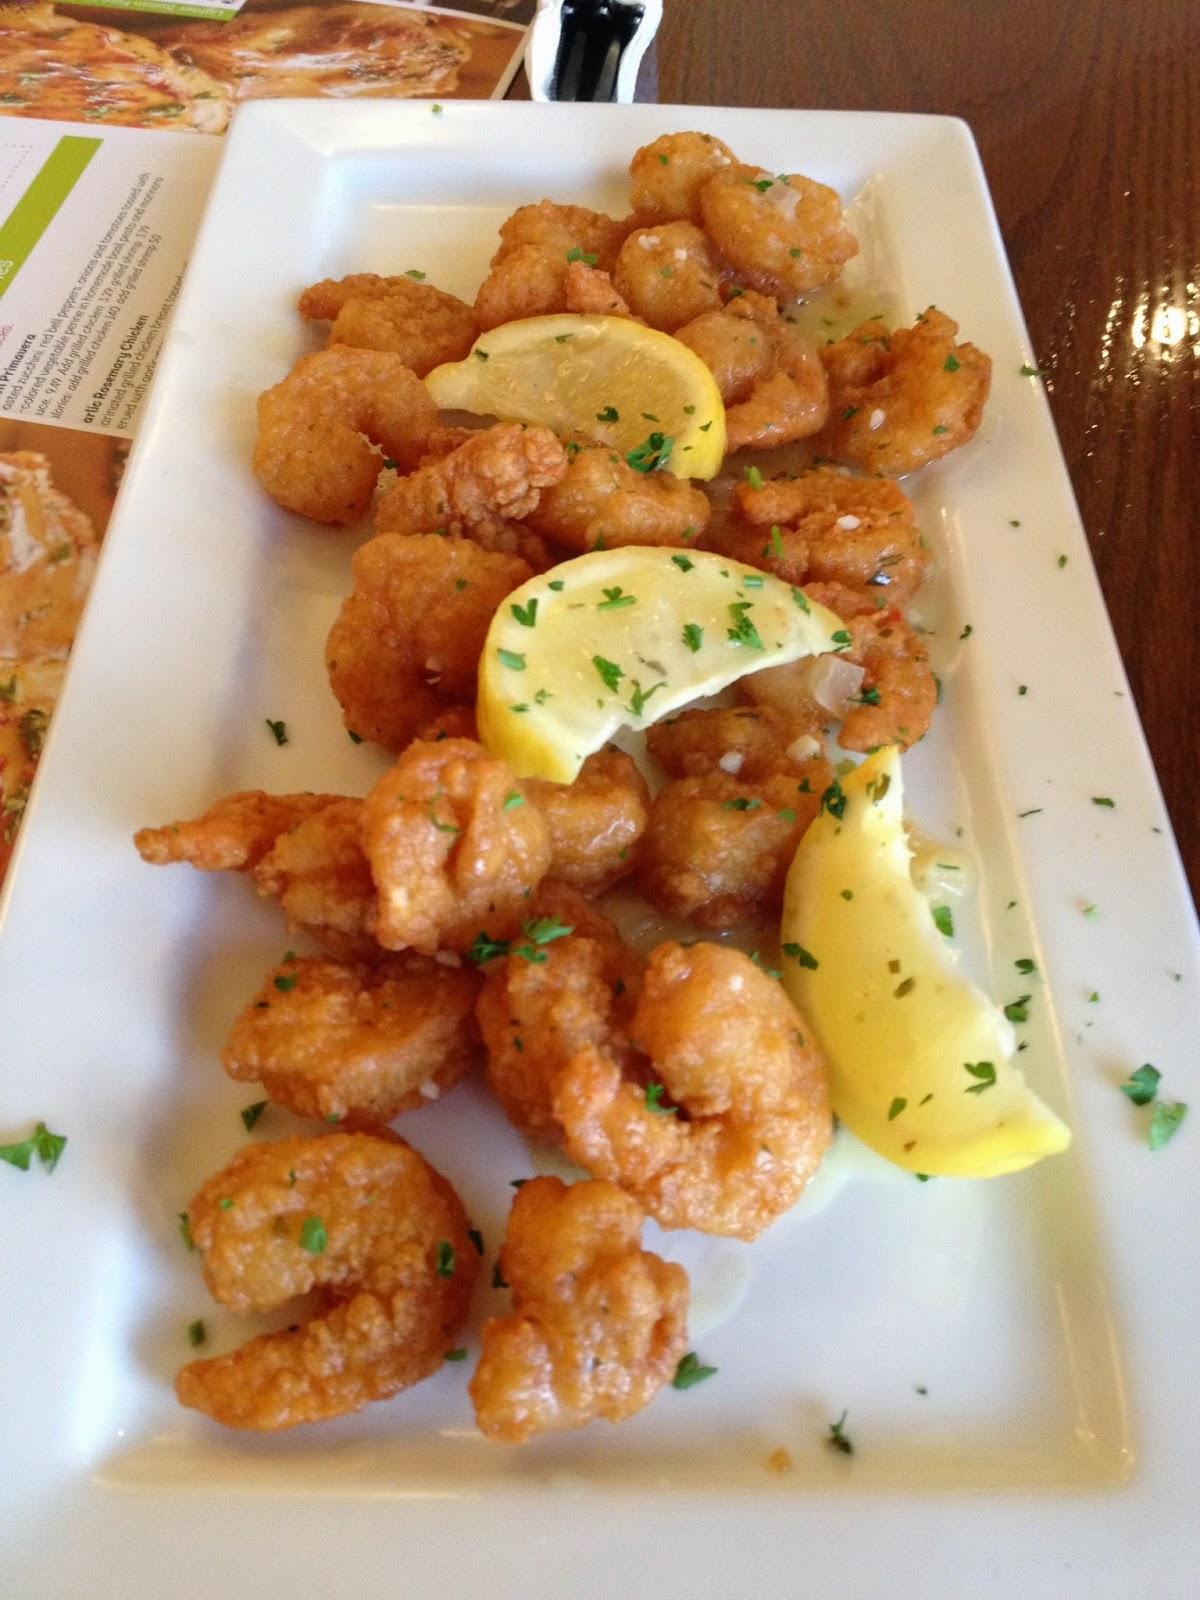 Olive garden shrimp scampi fritta - Olive garden shrimp scampi fritta recipe ...